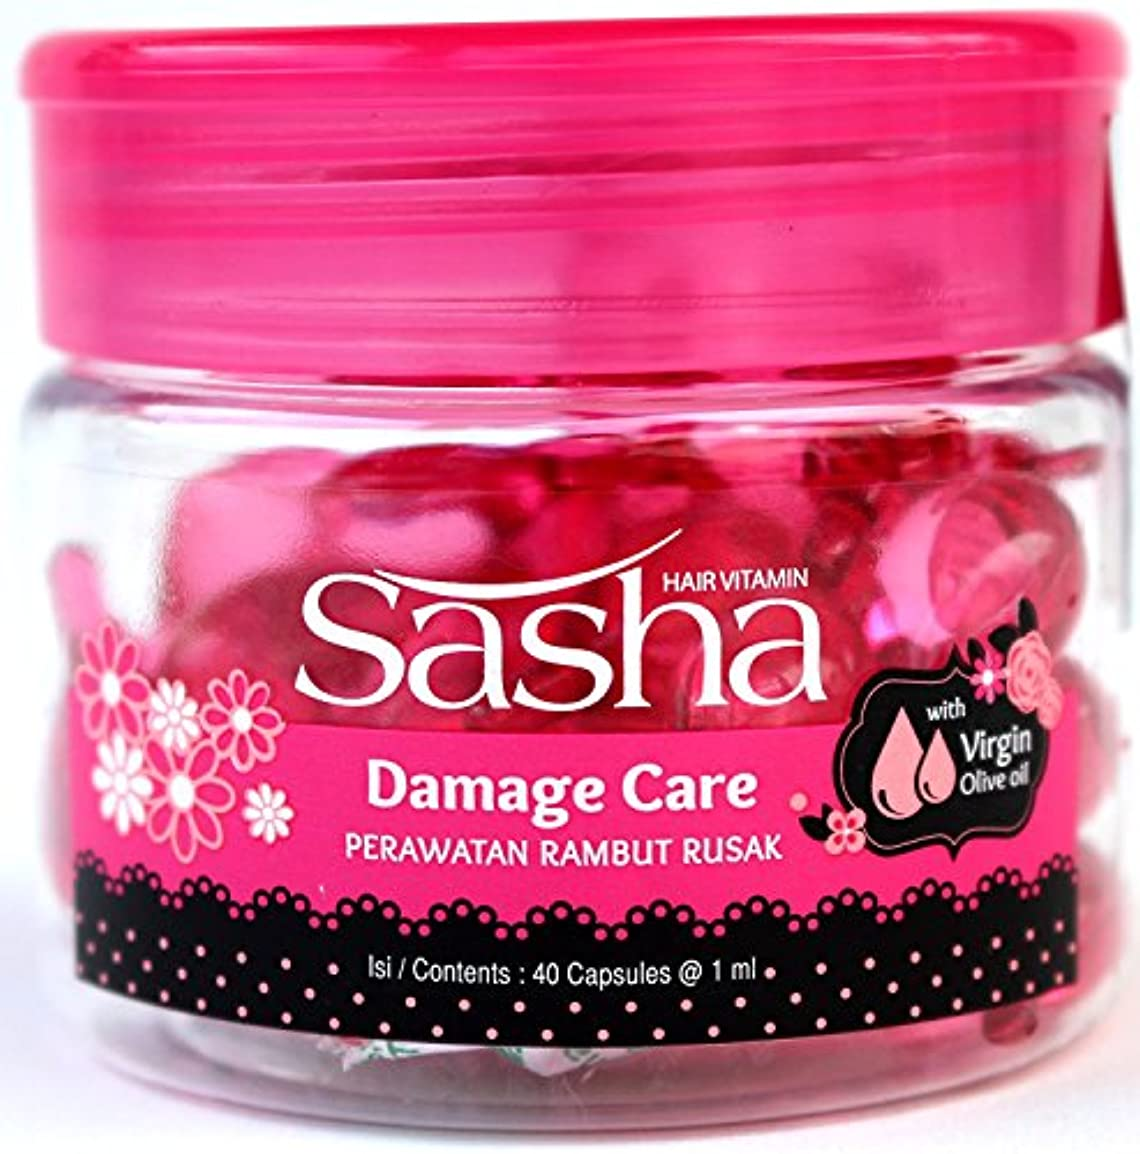 Sasha(サシャ)ヘアビタミン(40粒入)2個セット [並行輸入品][海外直送品]